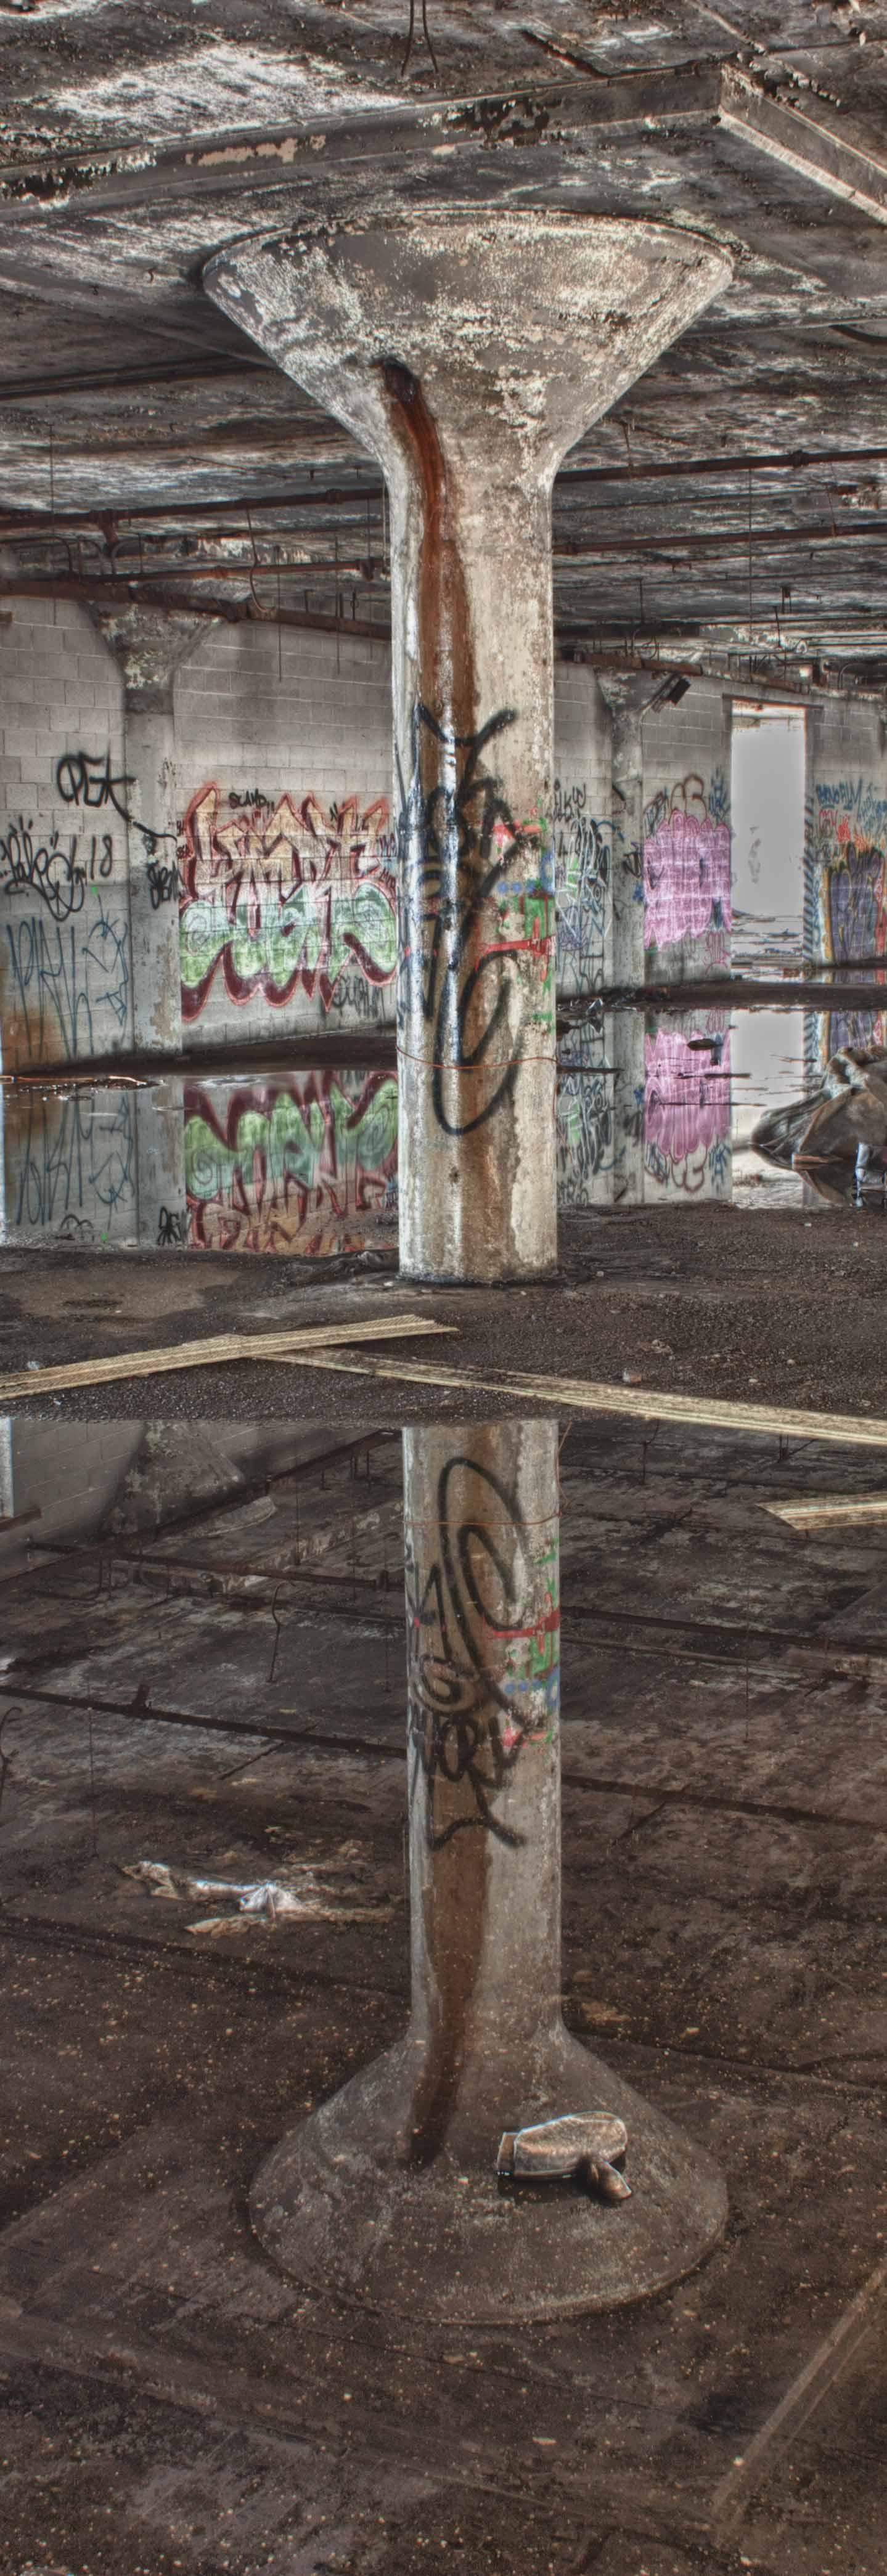 Reflection of a pillar.